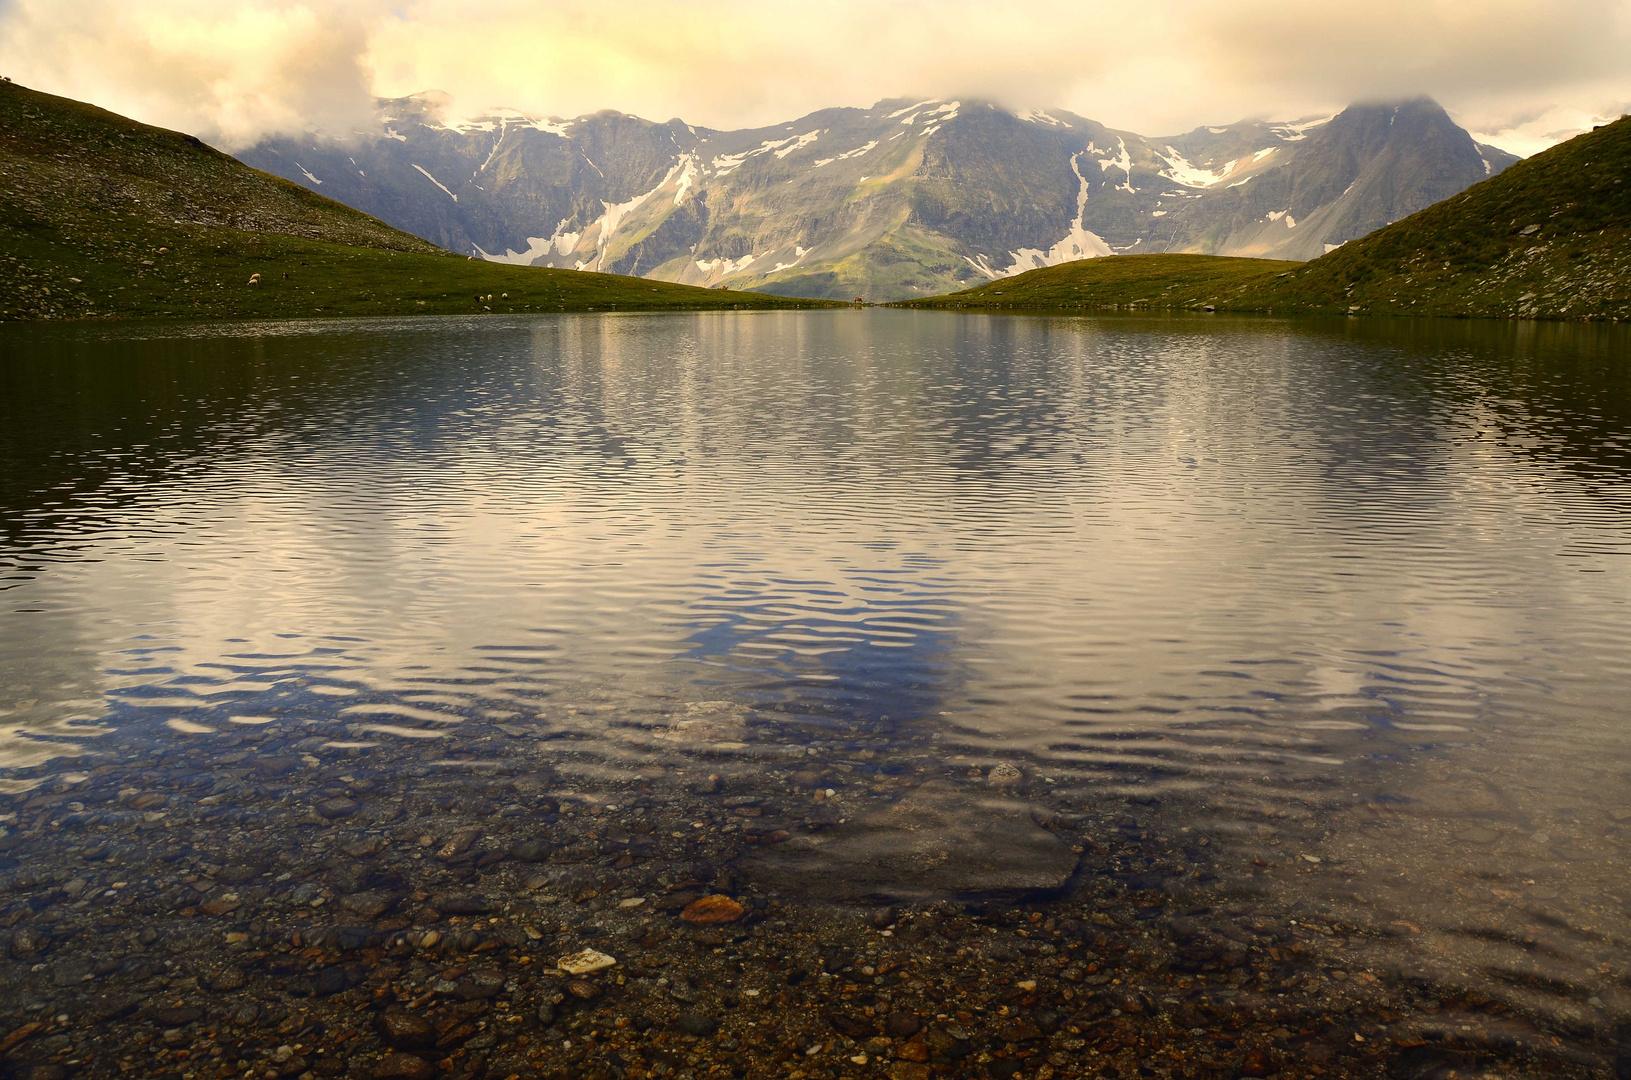 Morgenstimmung am Knappenbäudlsee